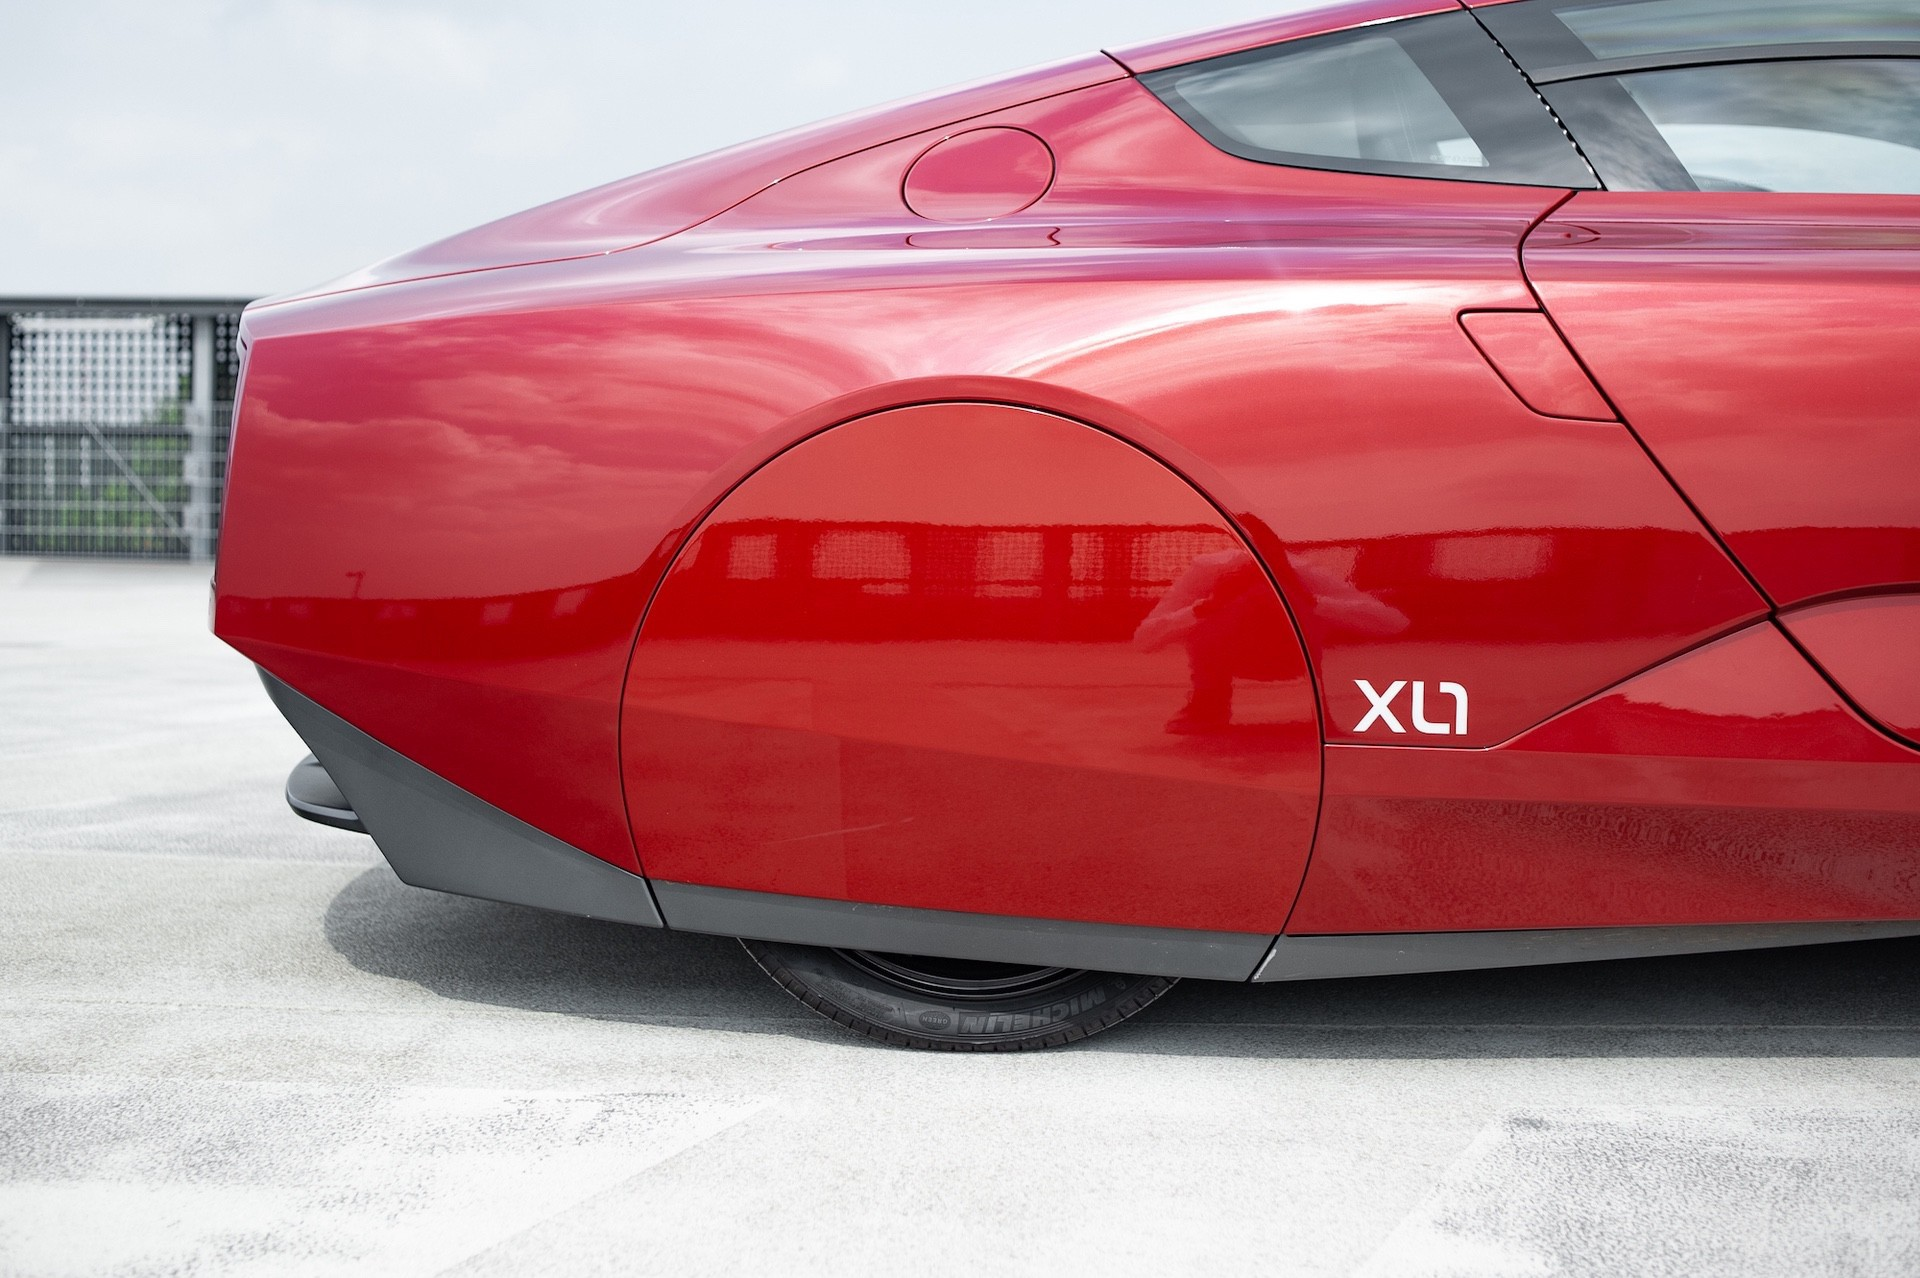 Volkswagen_XL1_sale-0027